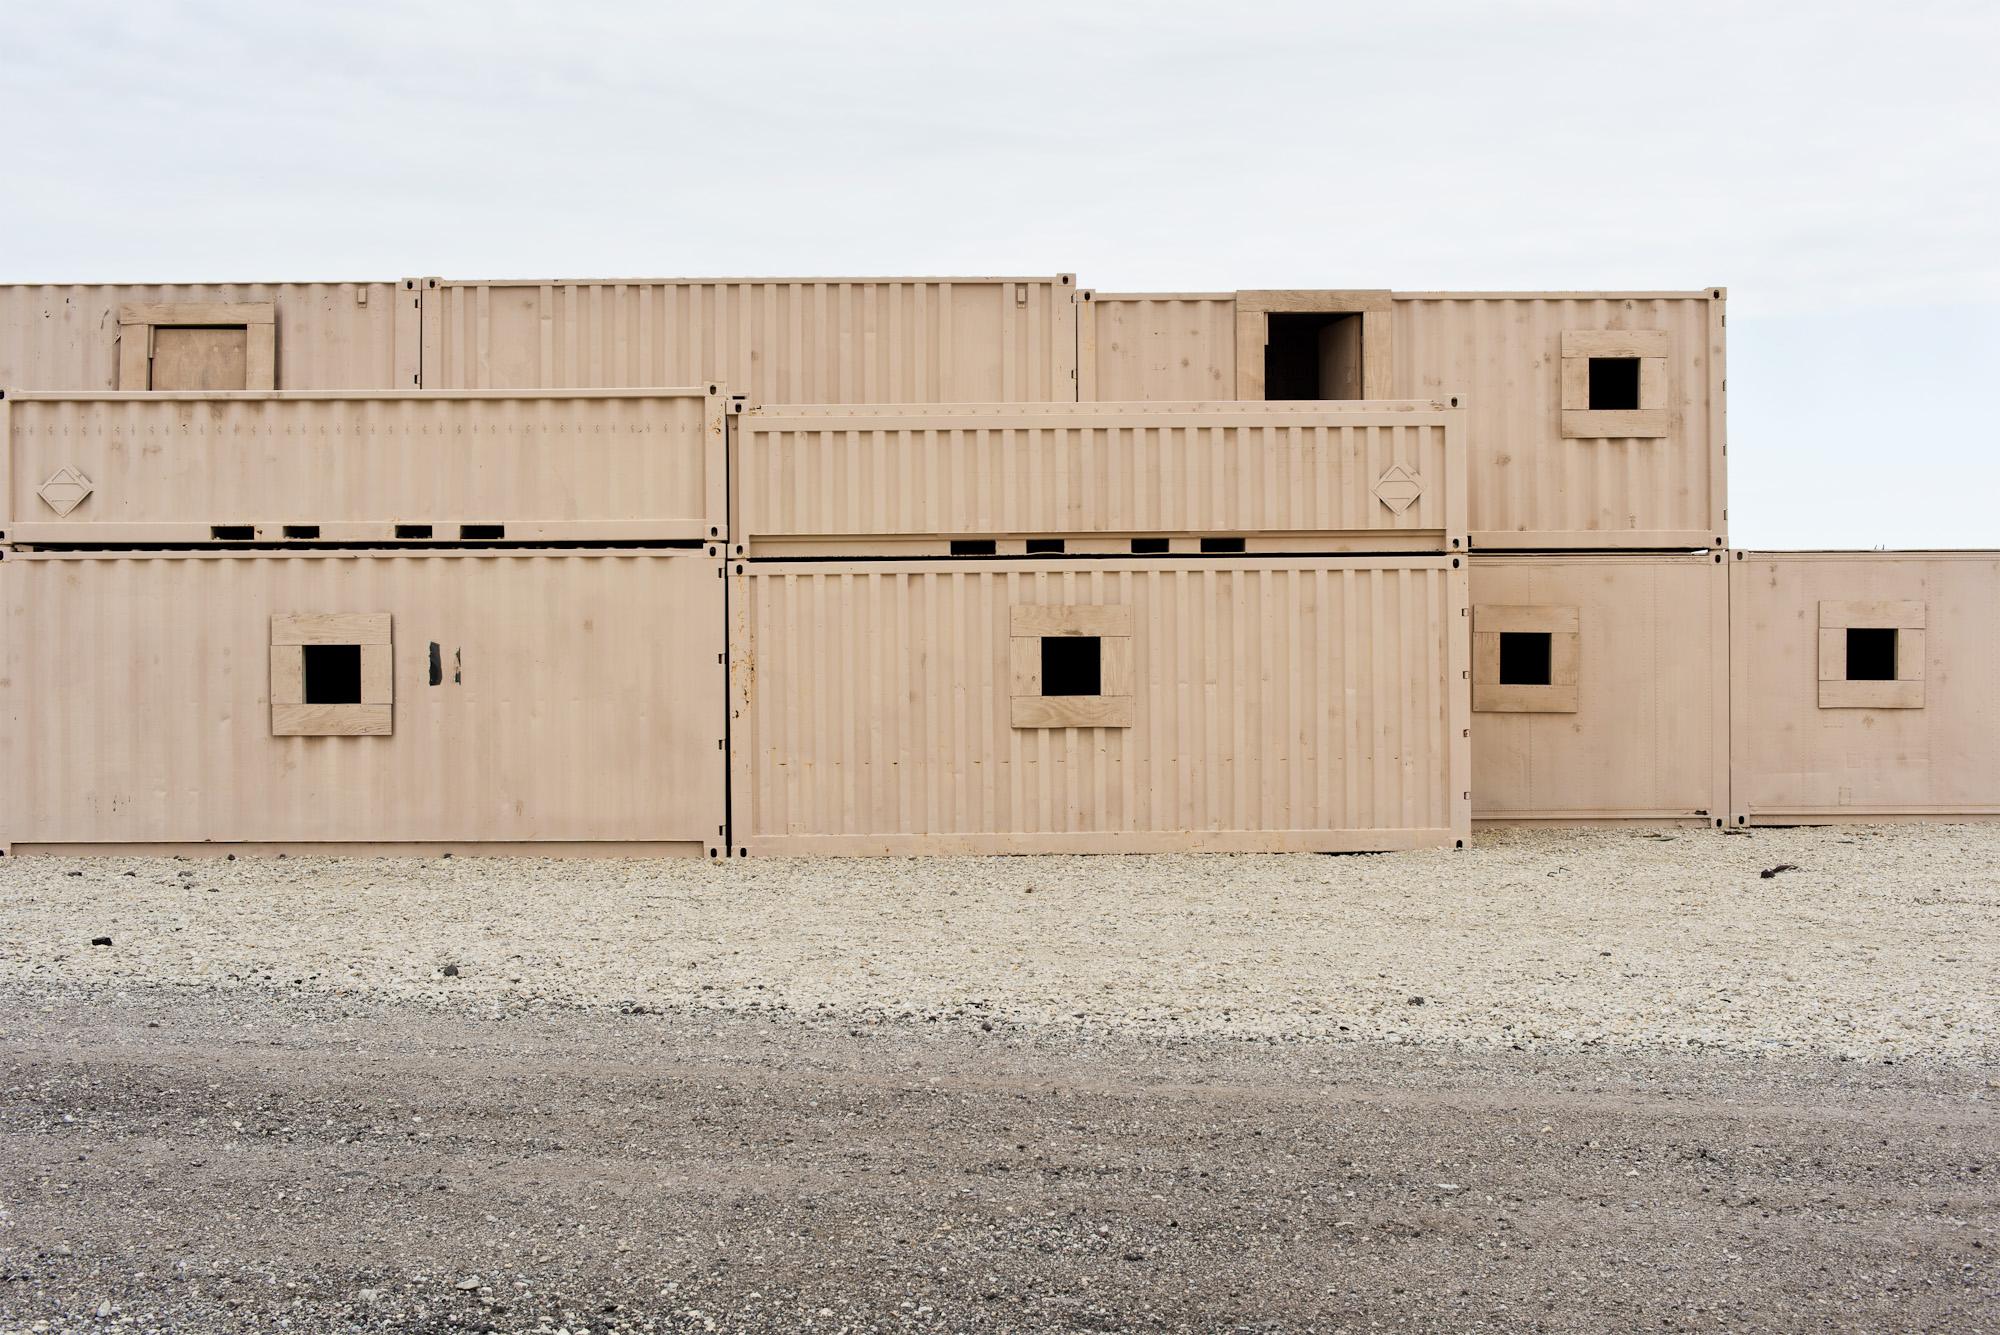 18. Stepped Housing, Live Fire Village #2, Fort Riley, KS